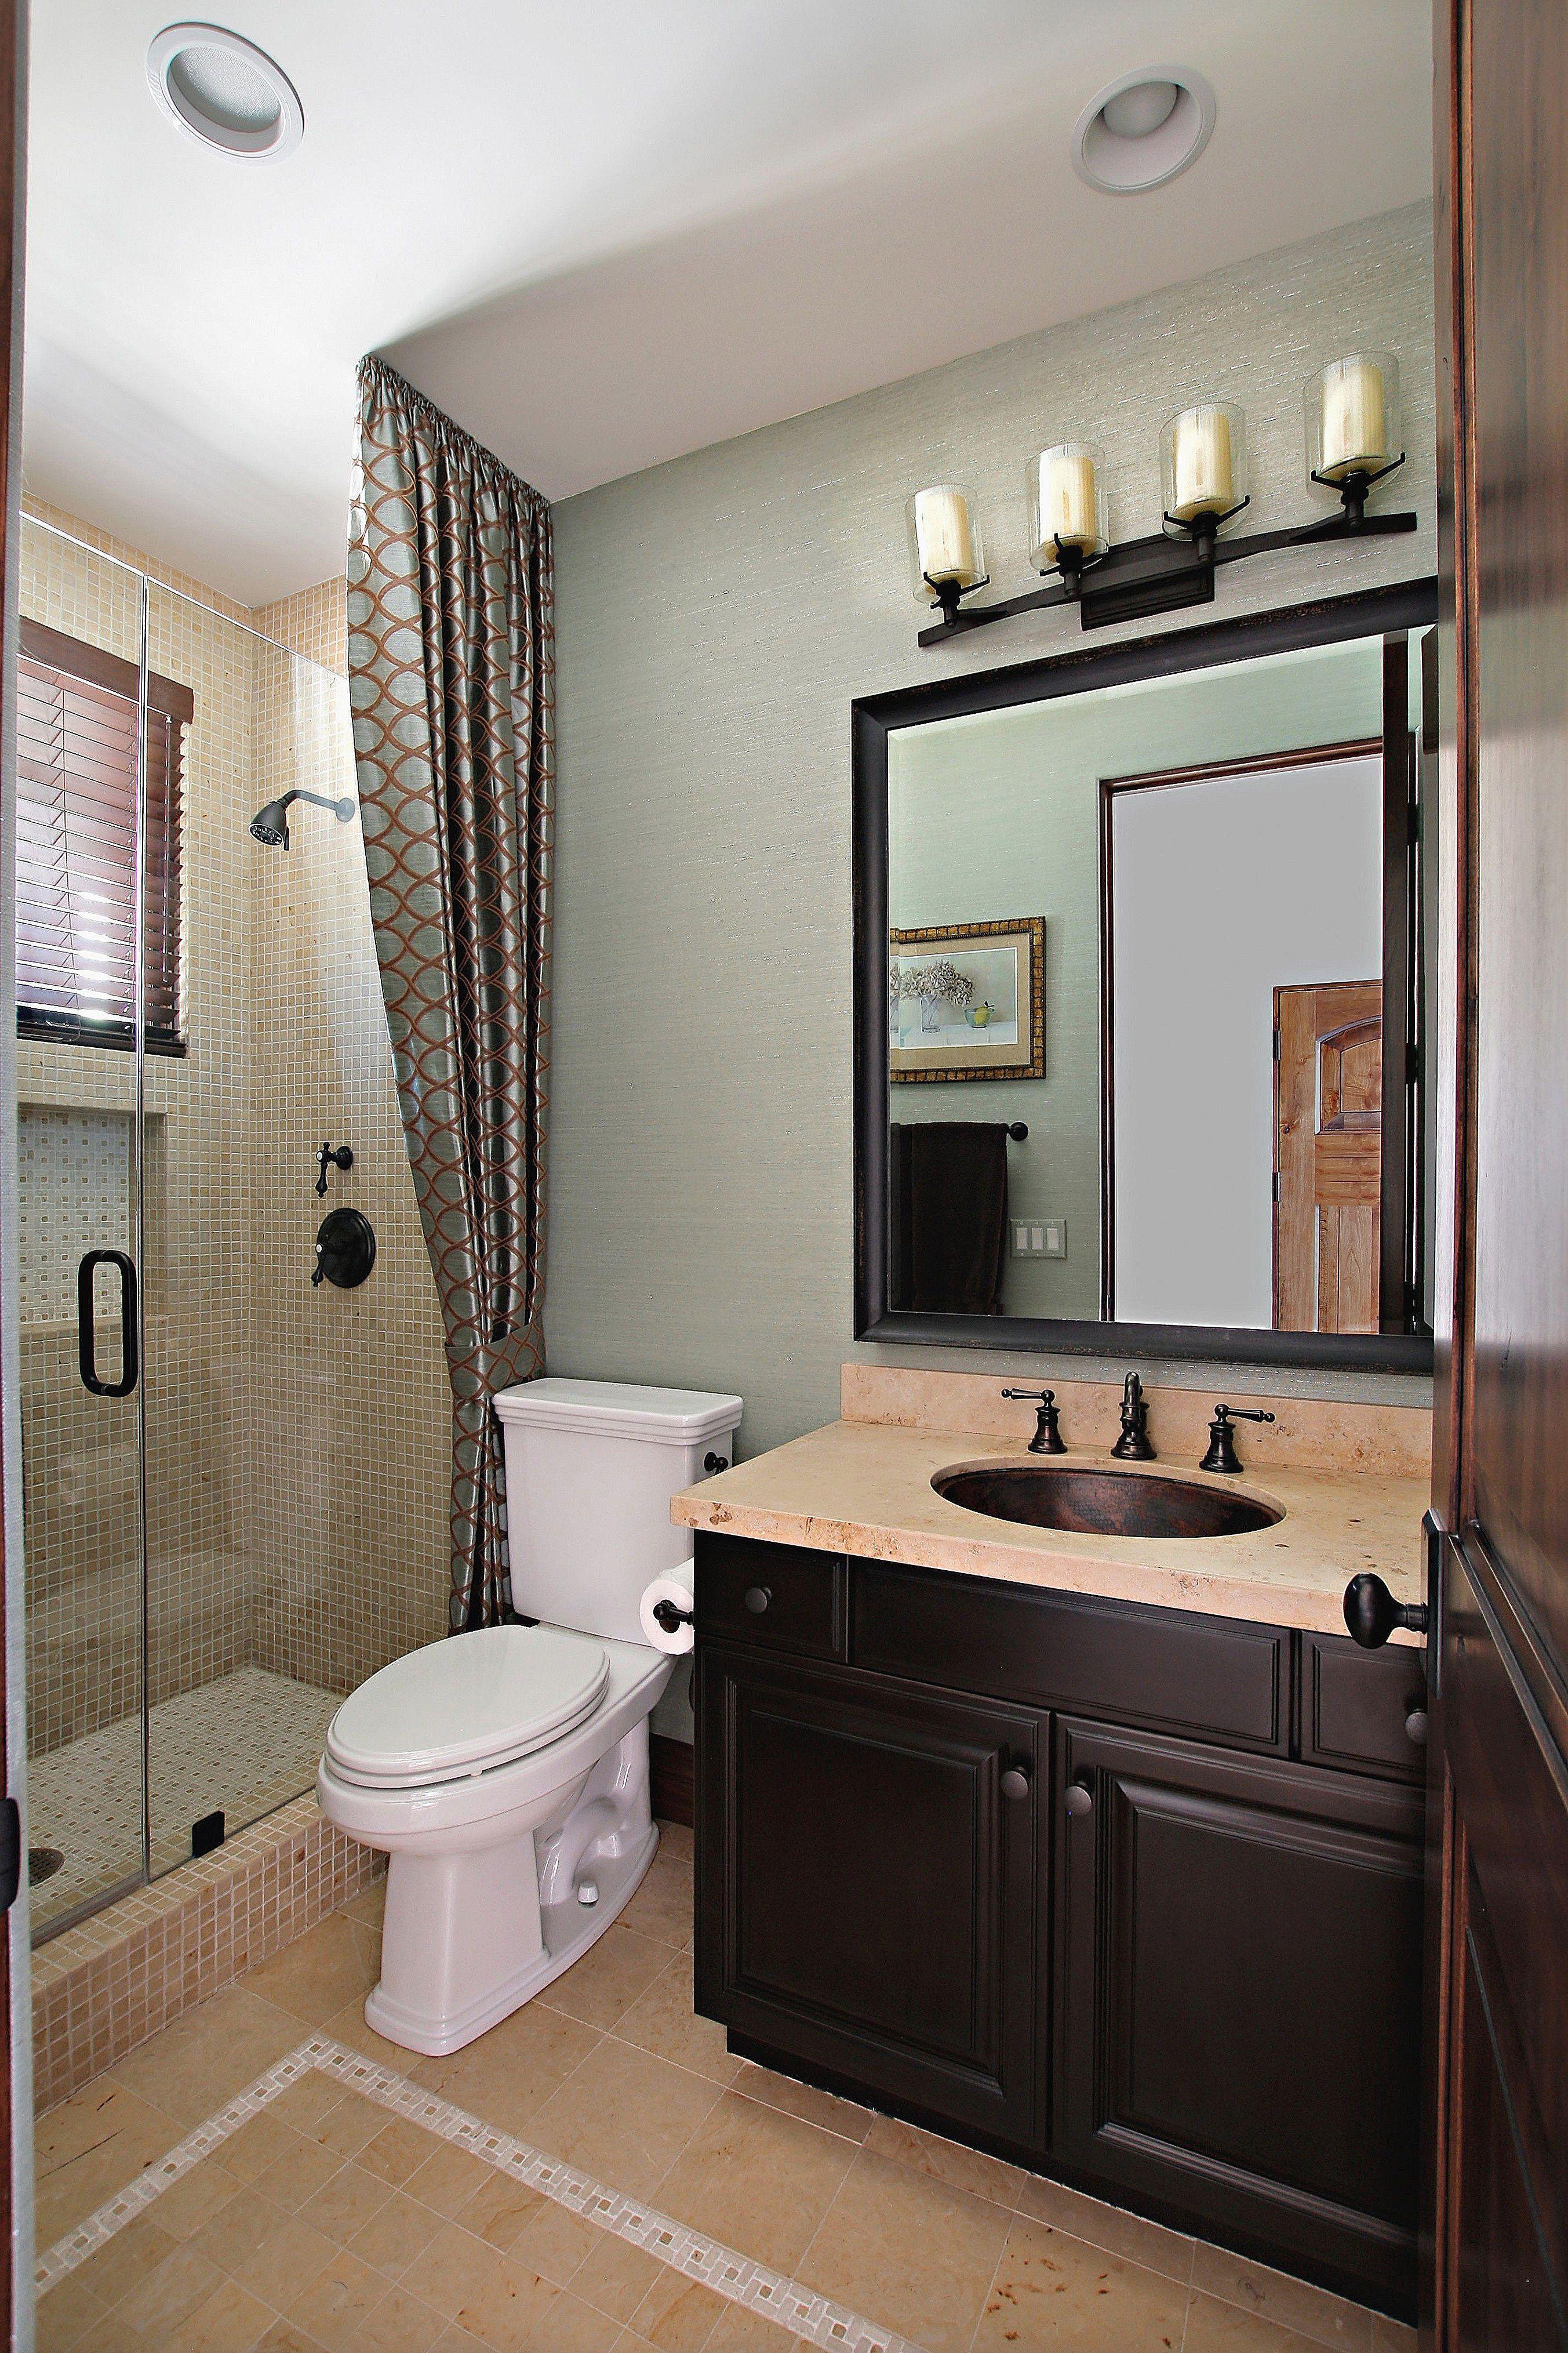 Inspirational Bathroom Design App (With images) | Bathroom ...